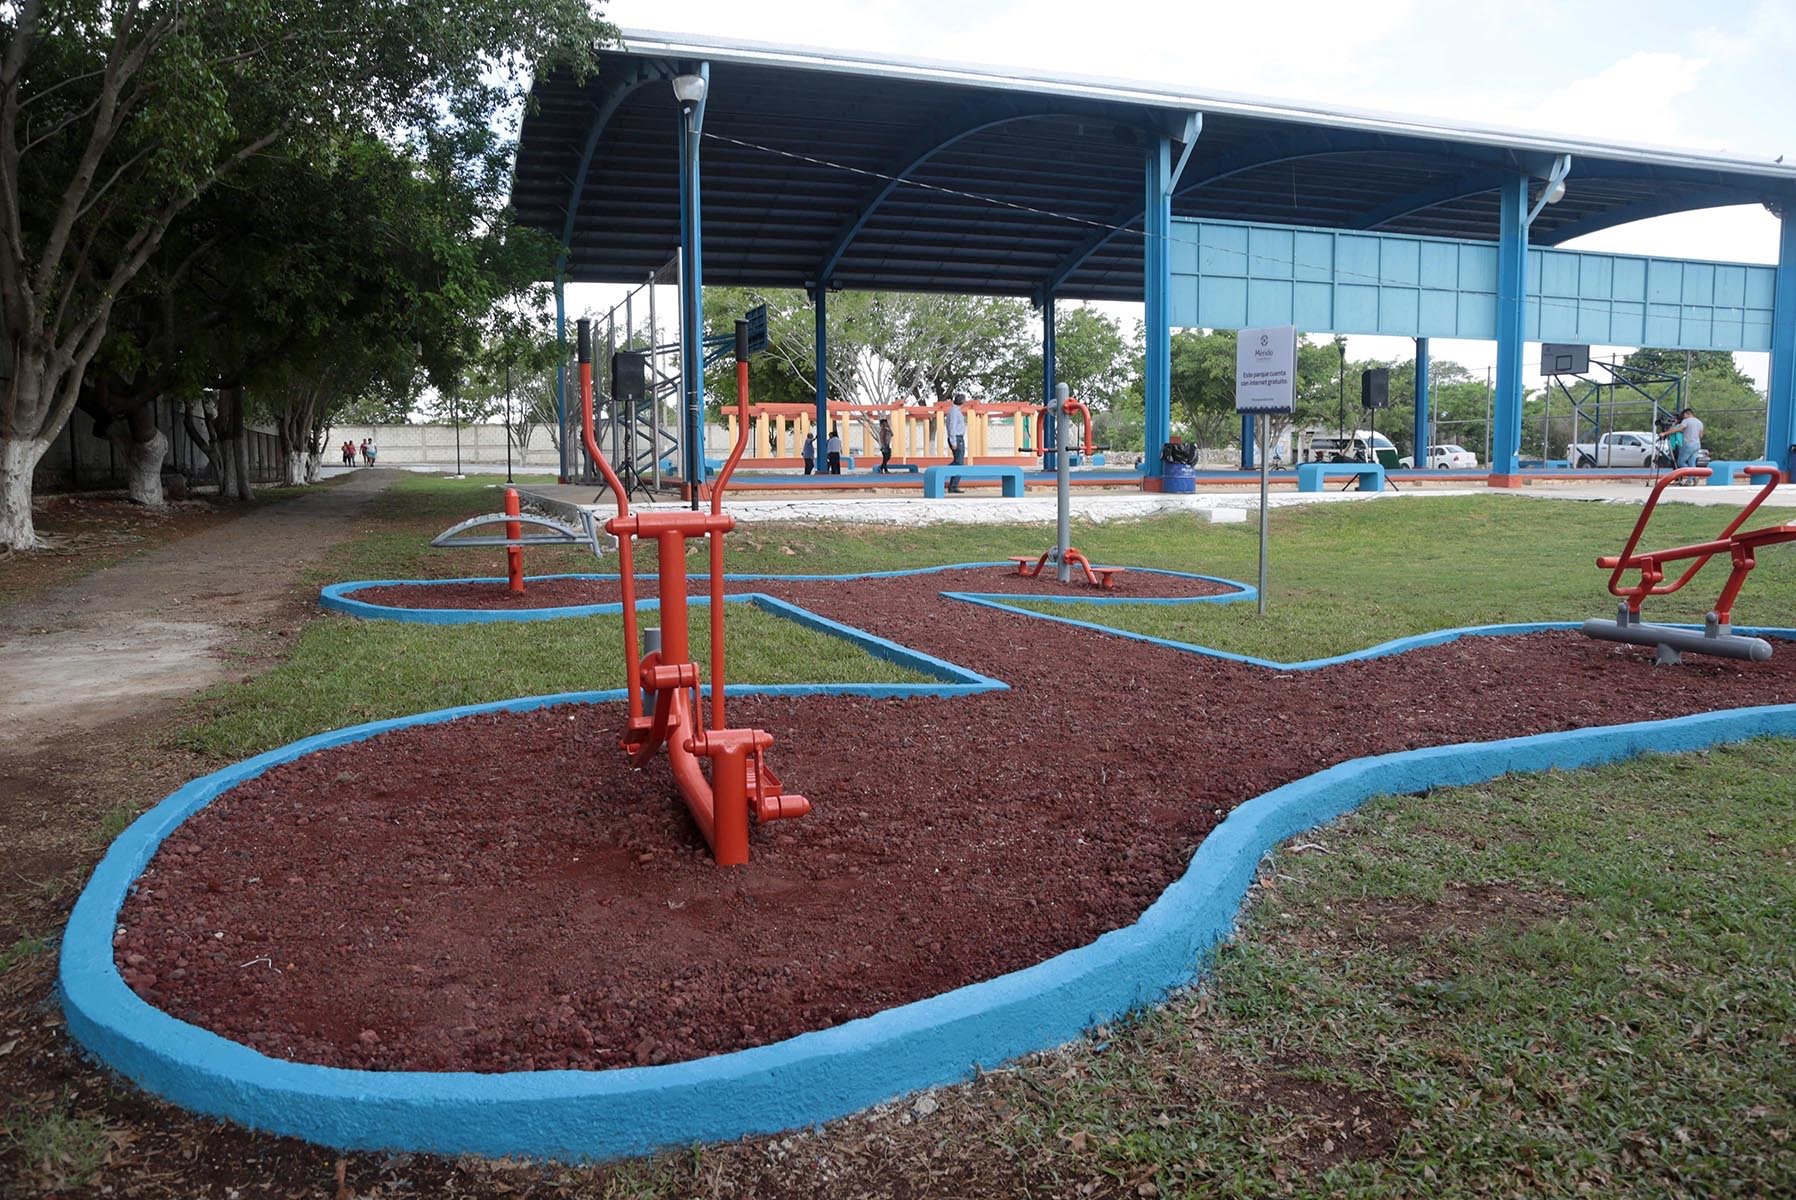 Casi 90 parques de Mérida contarán con ejercitadores